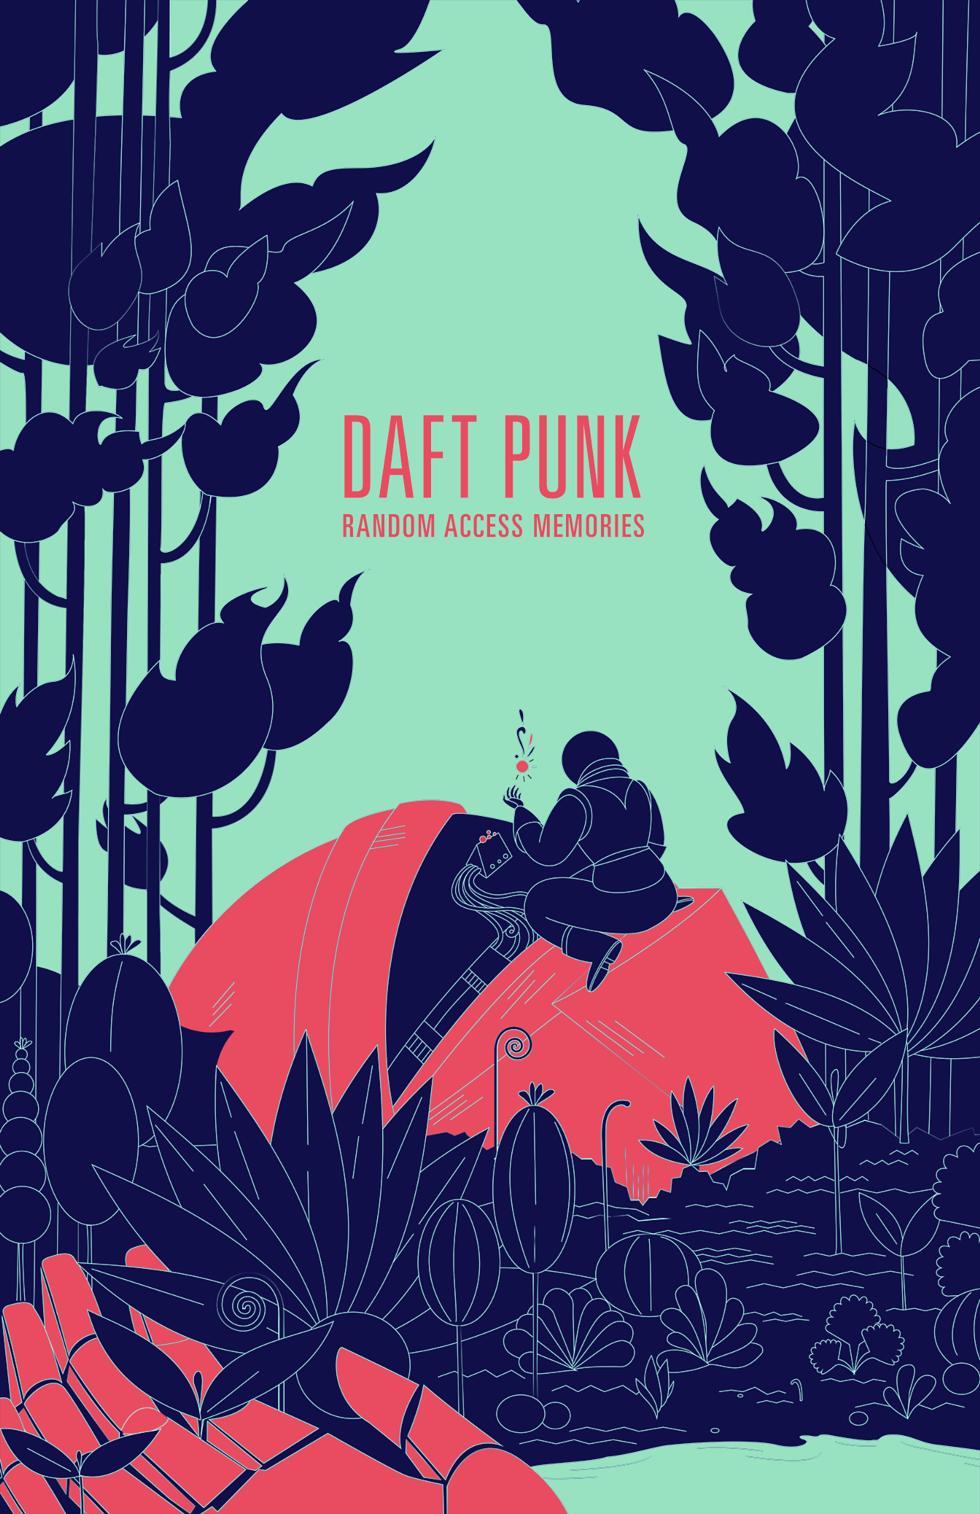 Poster design contest - 99designs Unofficial Daft Punk Community Poster Design Contest Kimsalt S Entry